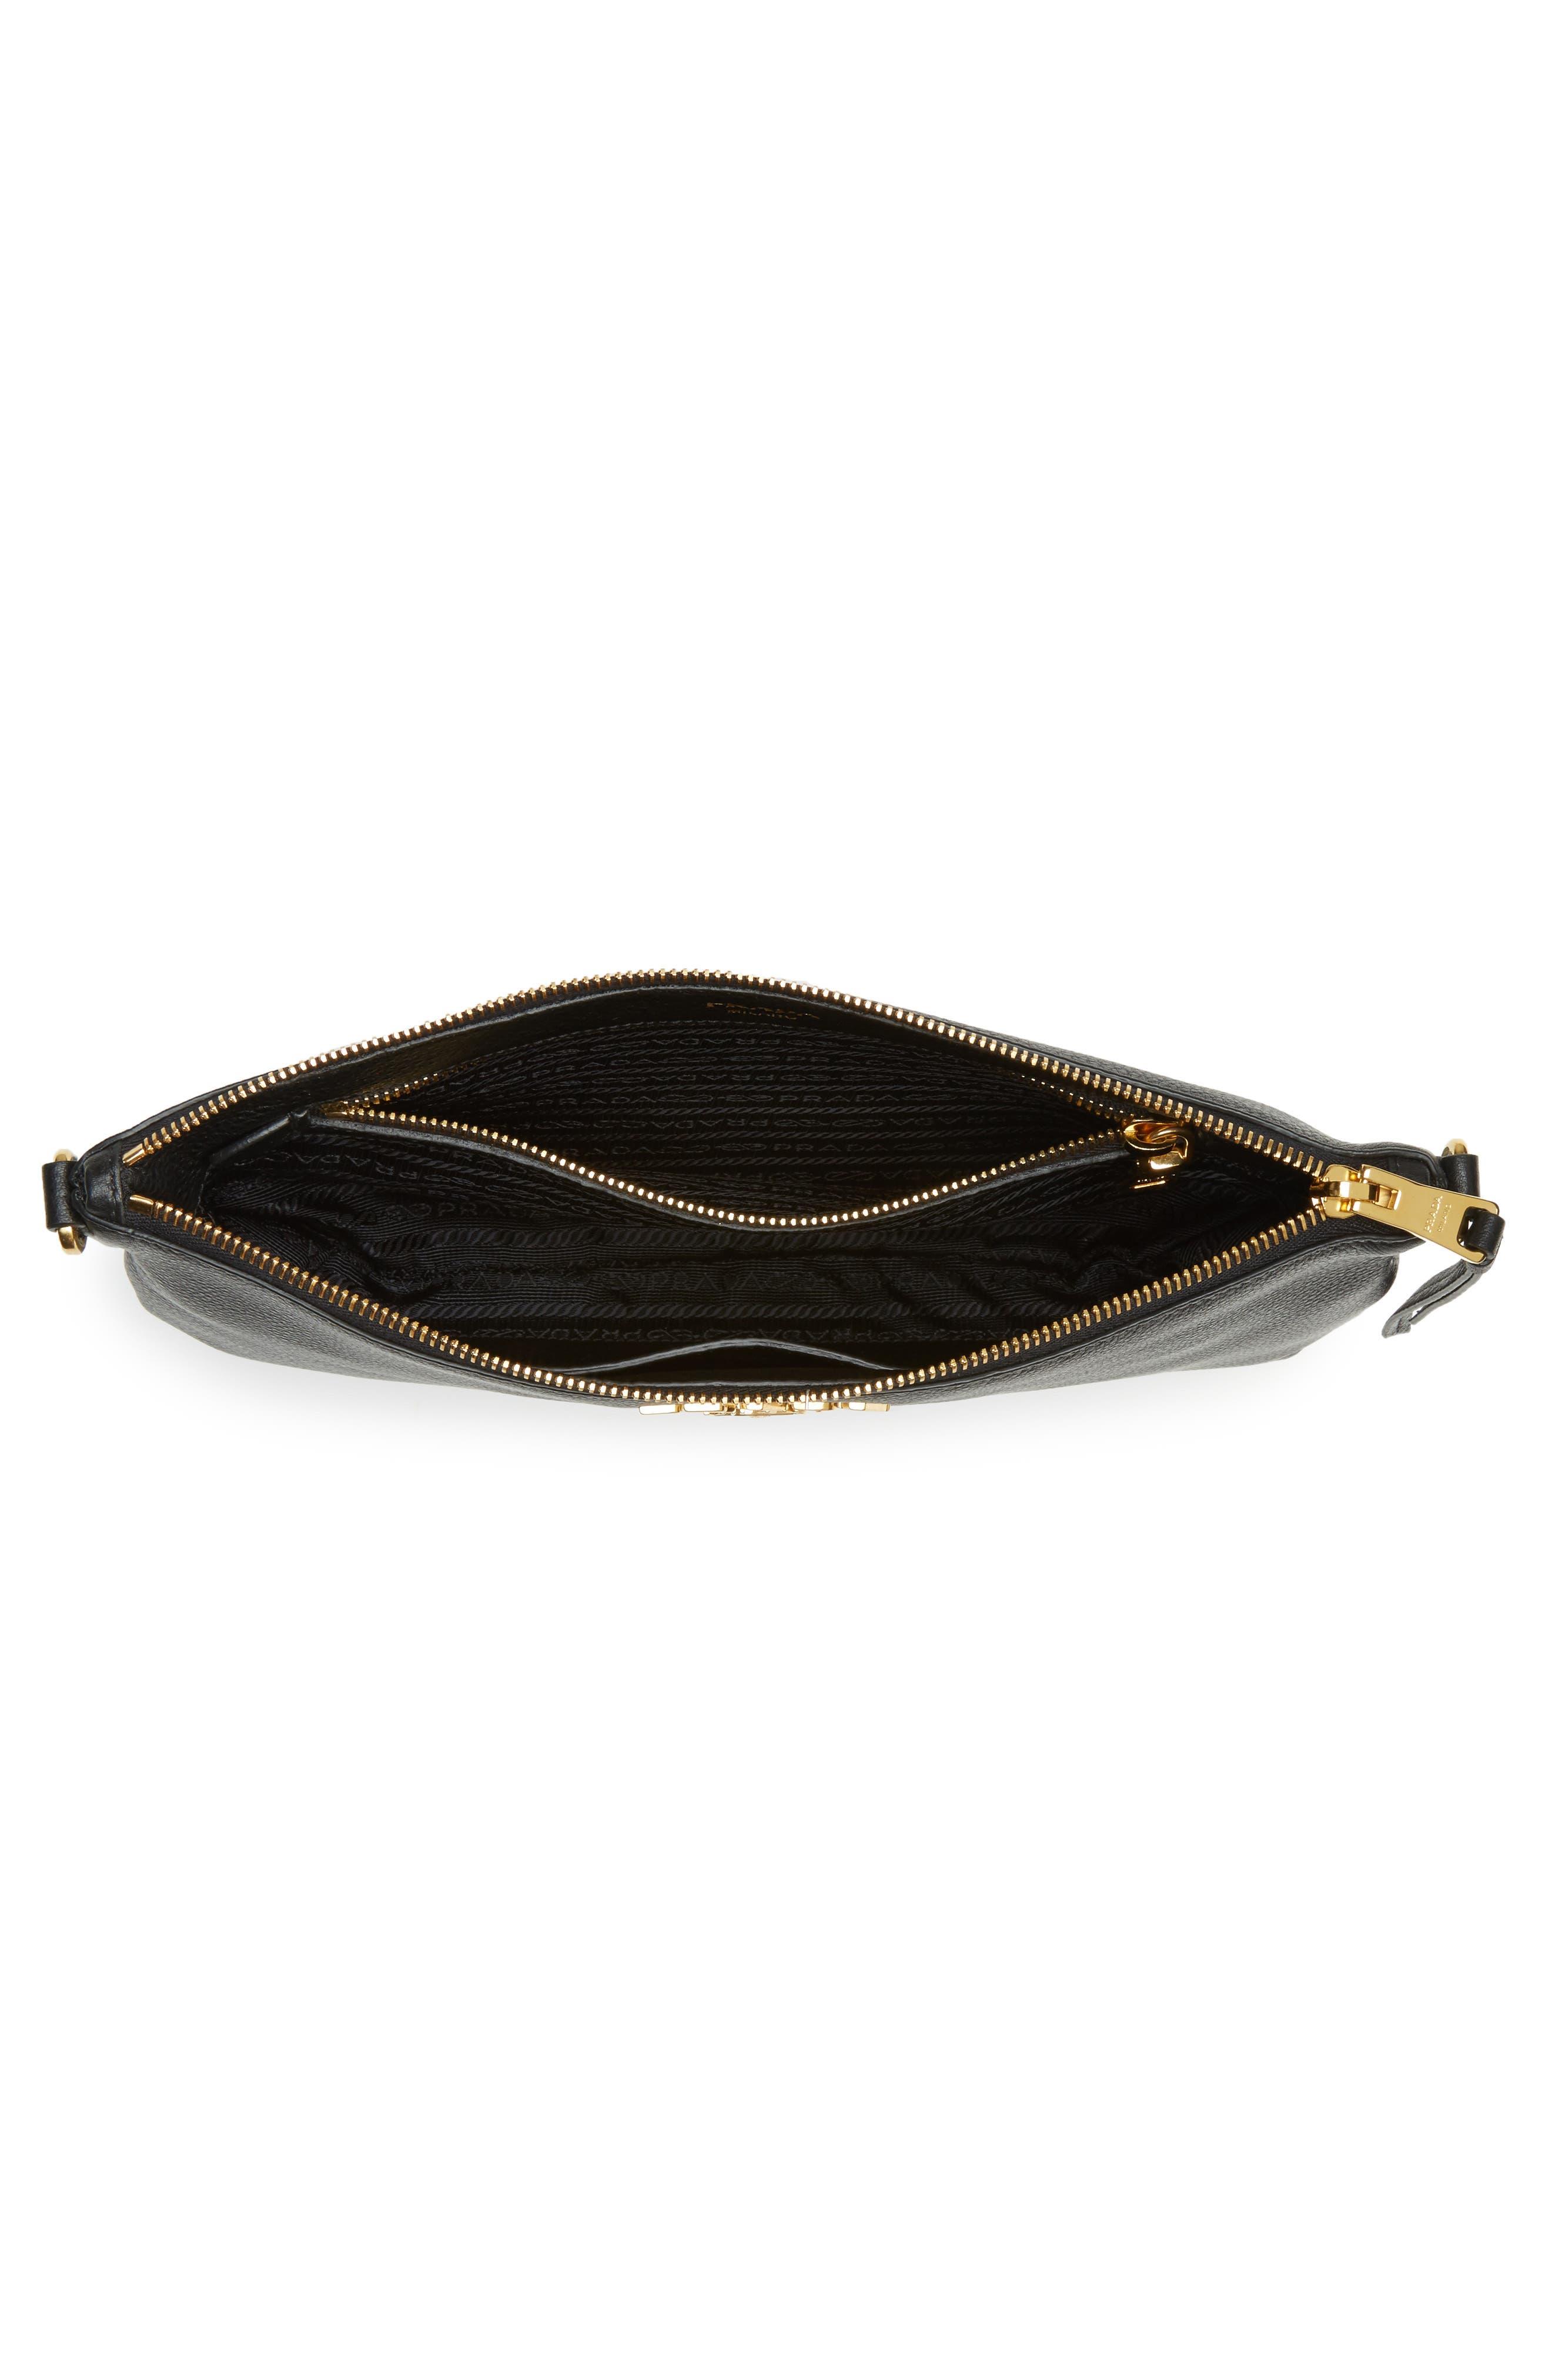 Vitello Daino Leather Crossbody Bag,                             Alternate thumbnail 5, color,                             001